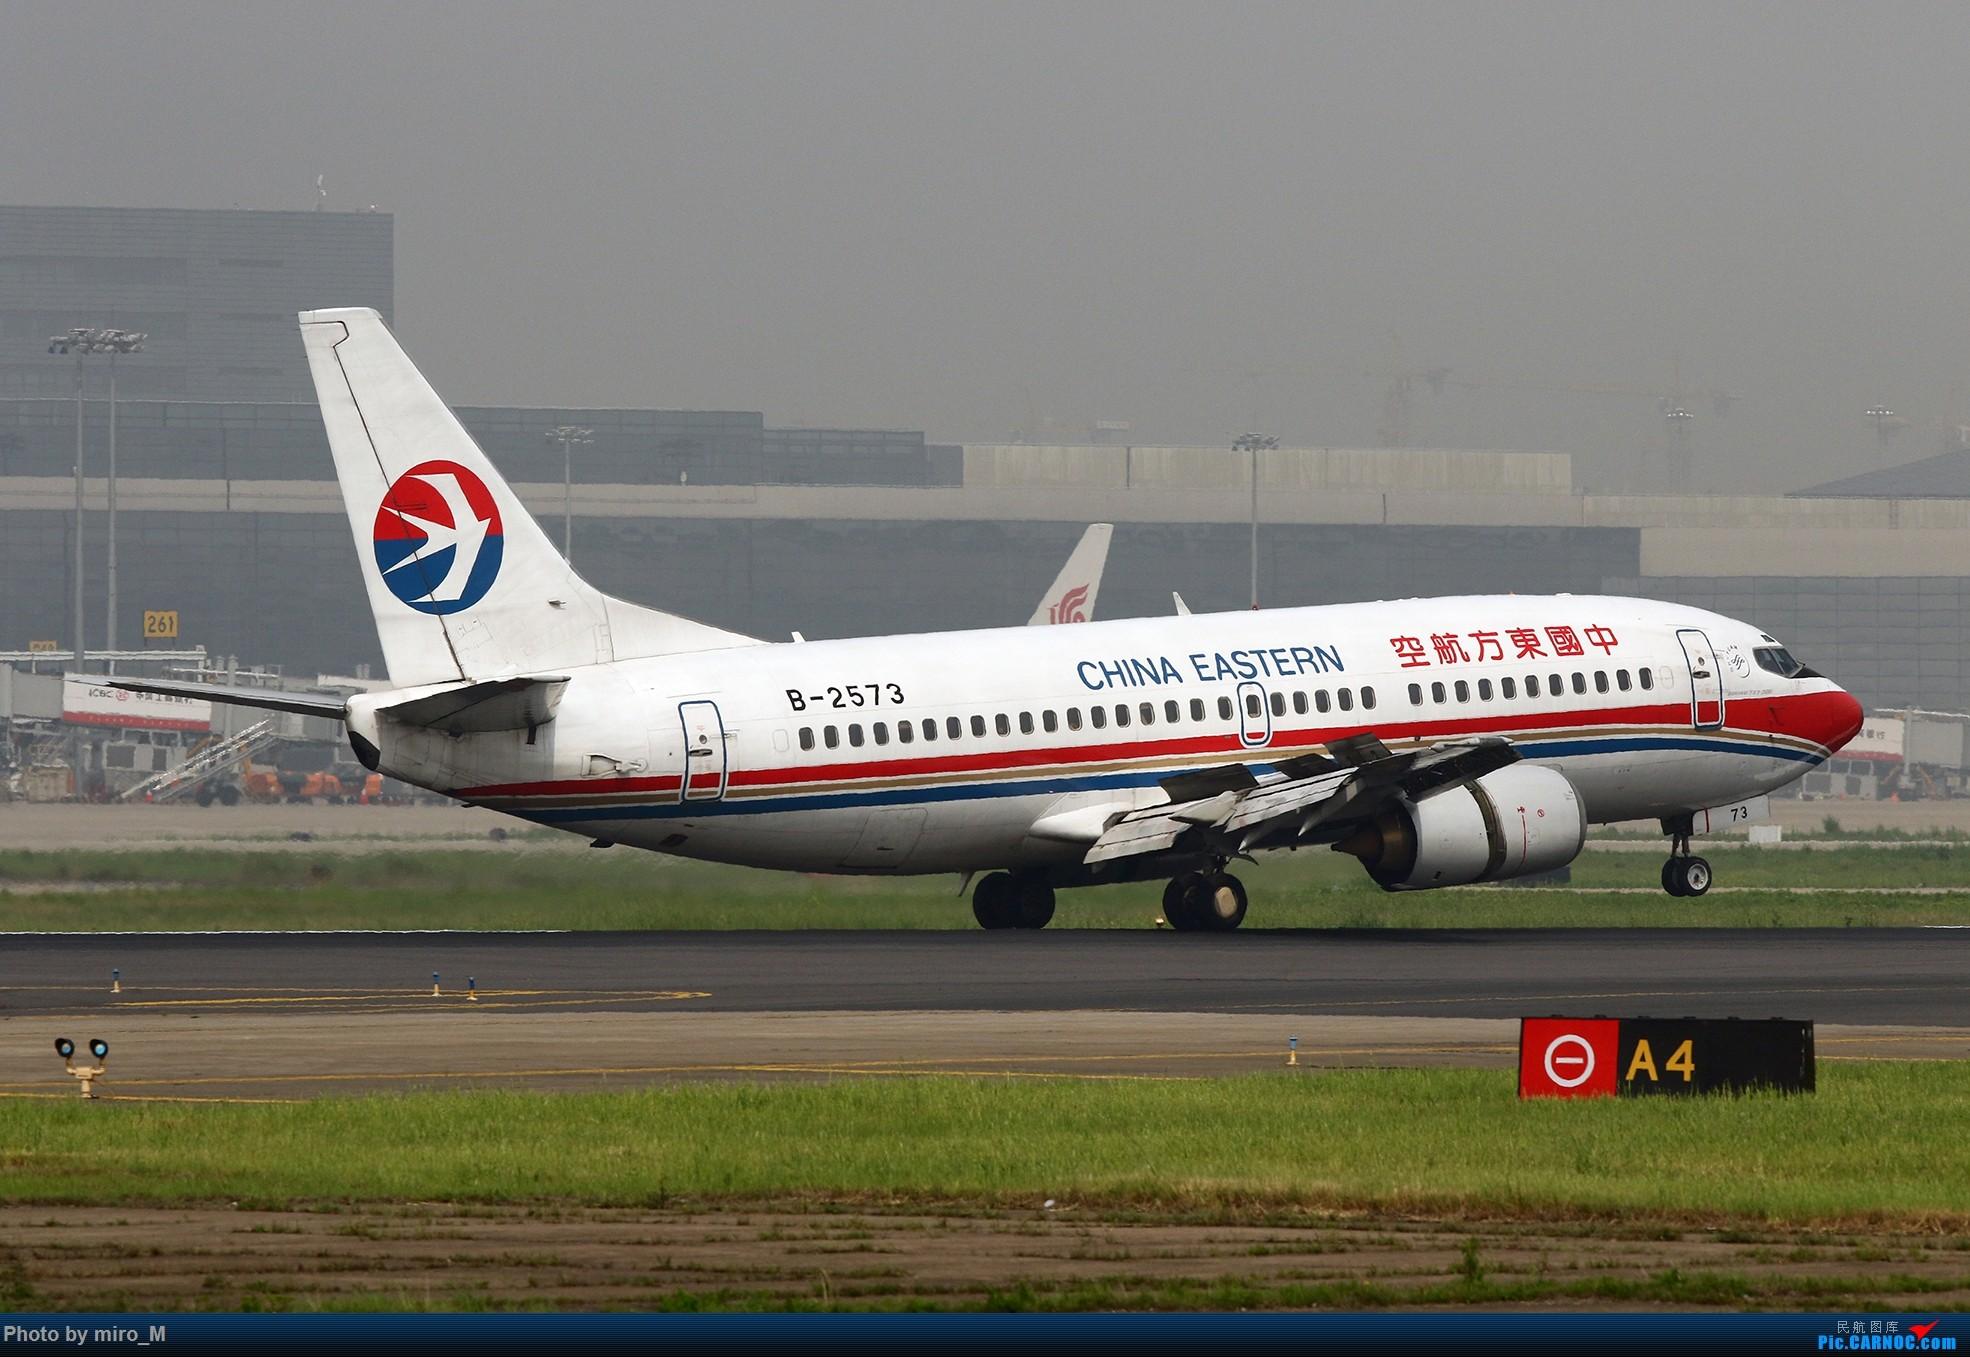 Re:[原创]烂天普通货………………虹桥412-414拍机合集 BOEING 737-300 B-2573 中国上海虹桥国际机场